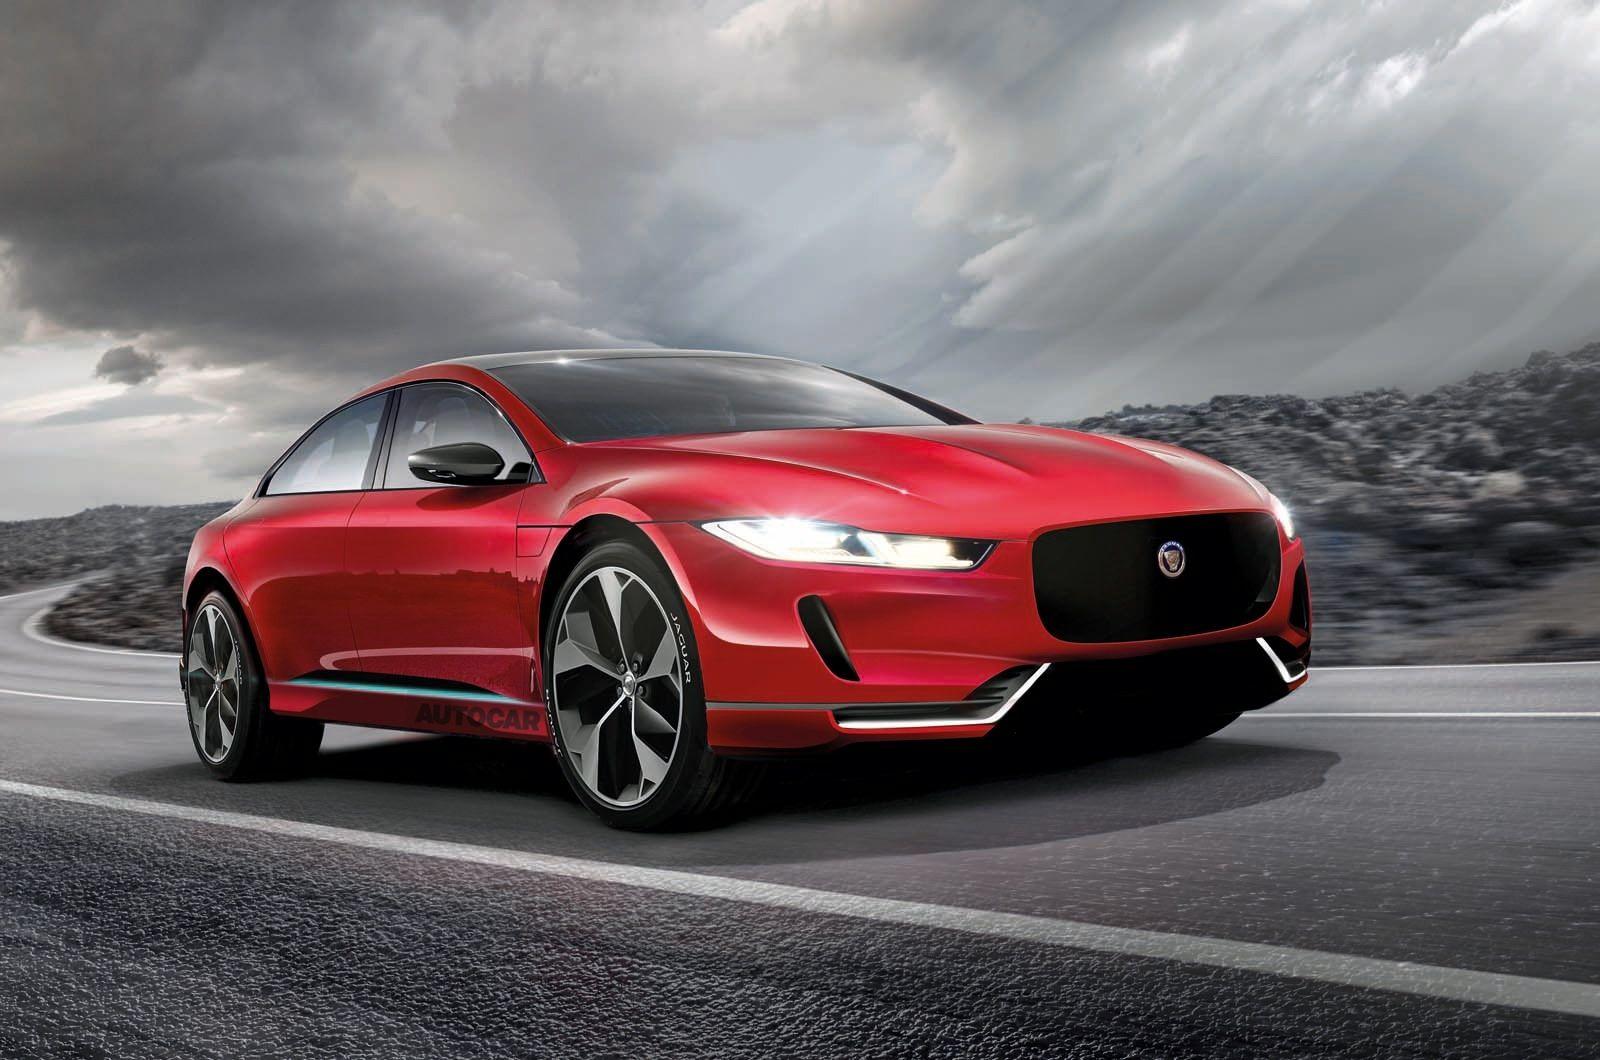 2021 Jaguar Xf Review Jaguar xj, Jaguar xe, Jaguar